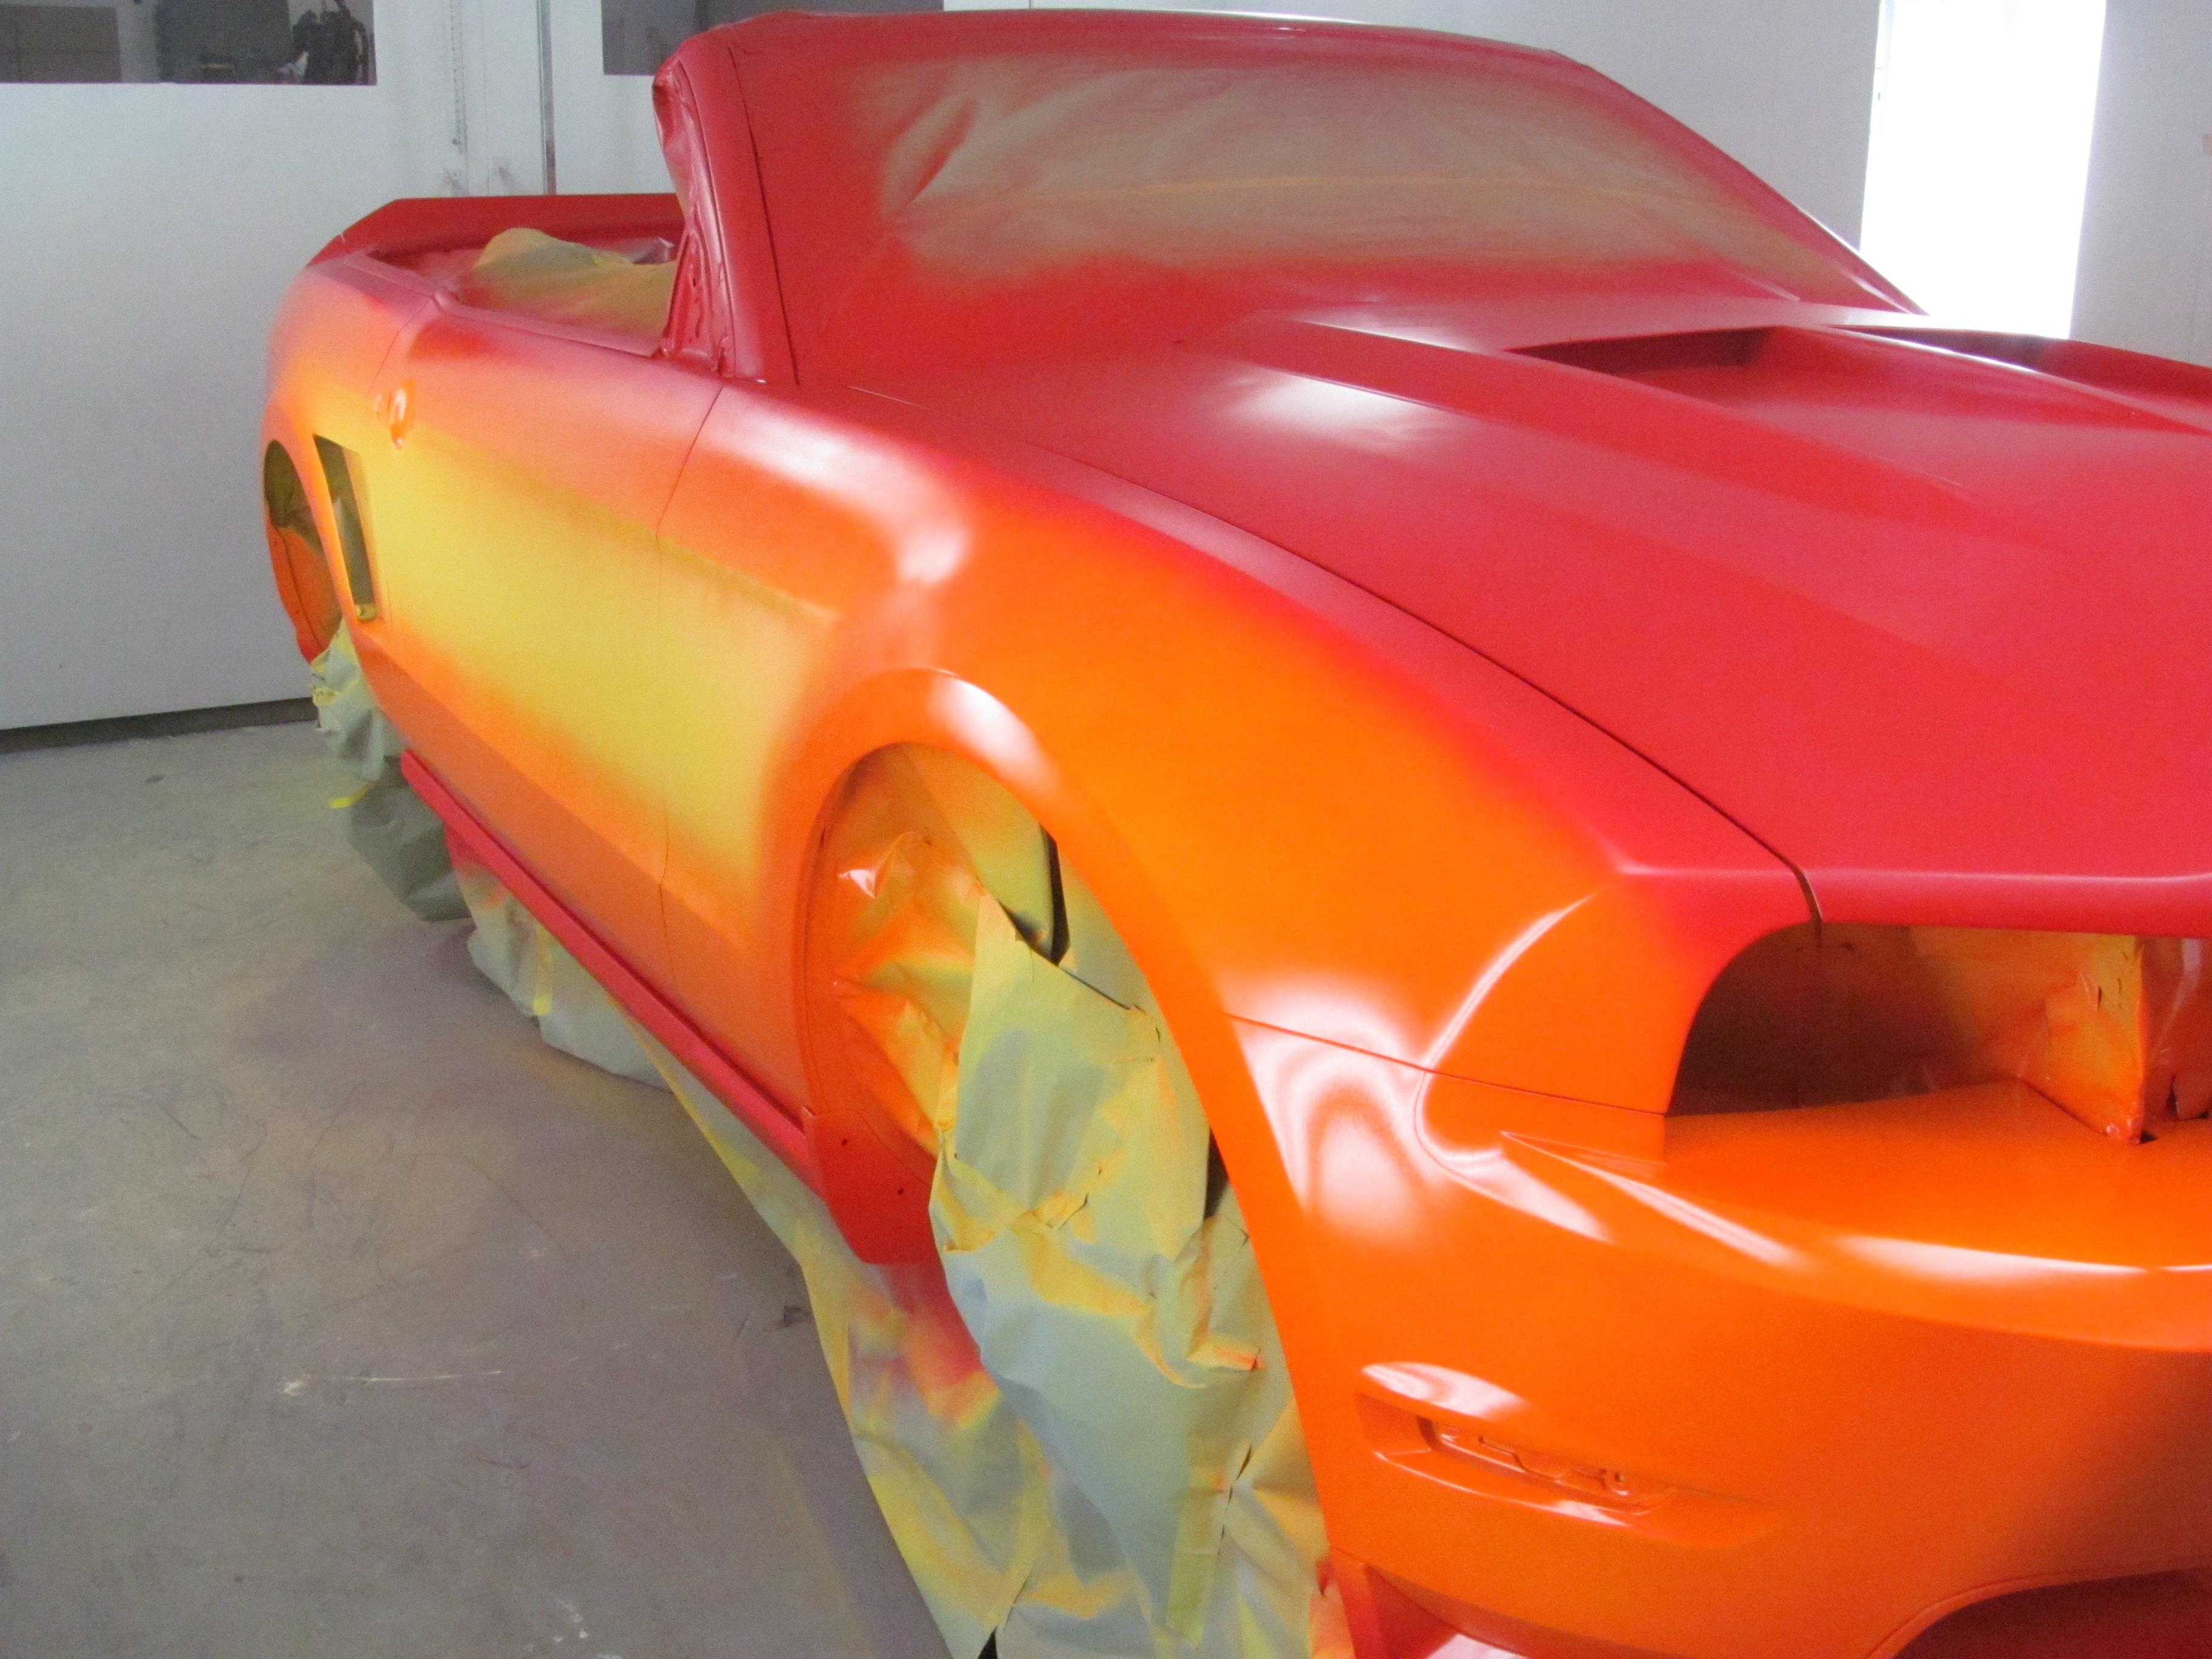 Popular Mechanics Top Shop: Netcong Auto Restorations, 2011 Custom Mustang GT